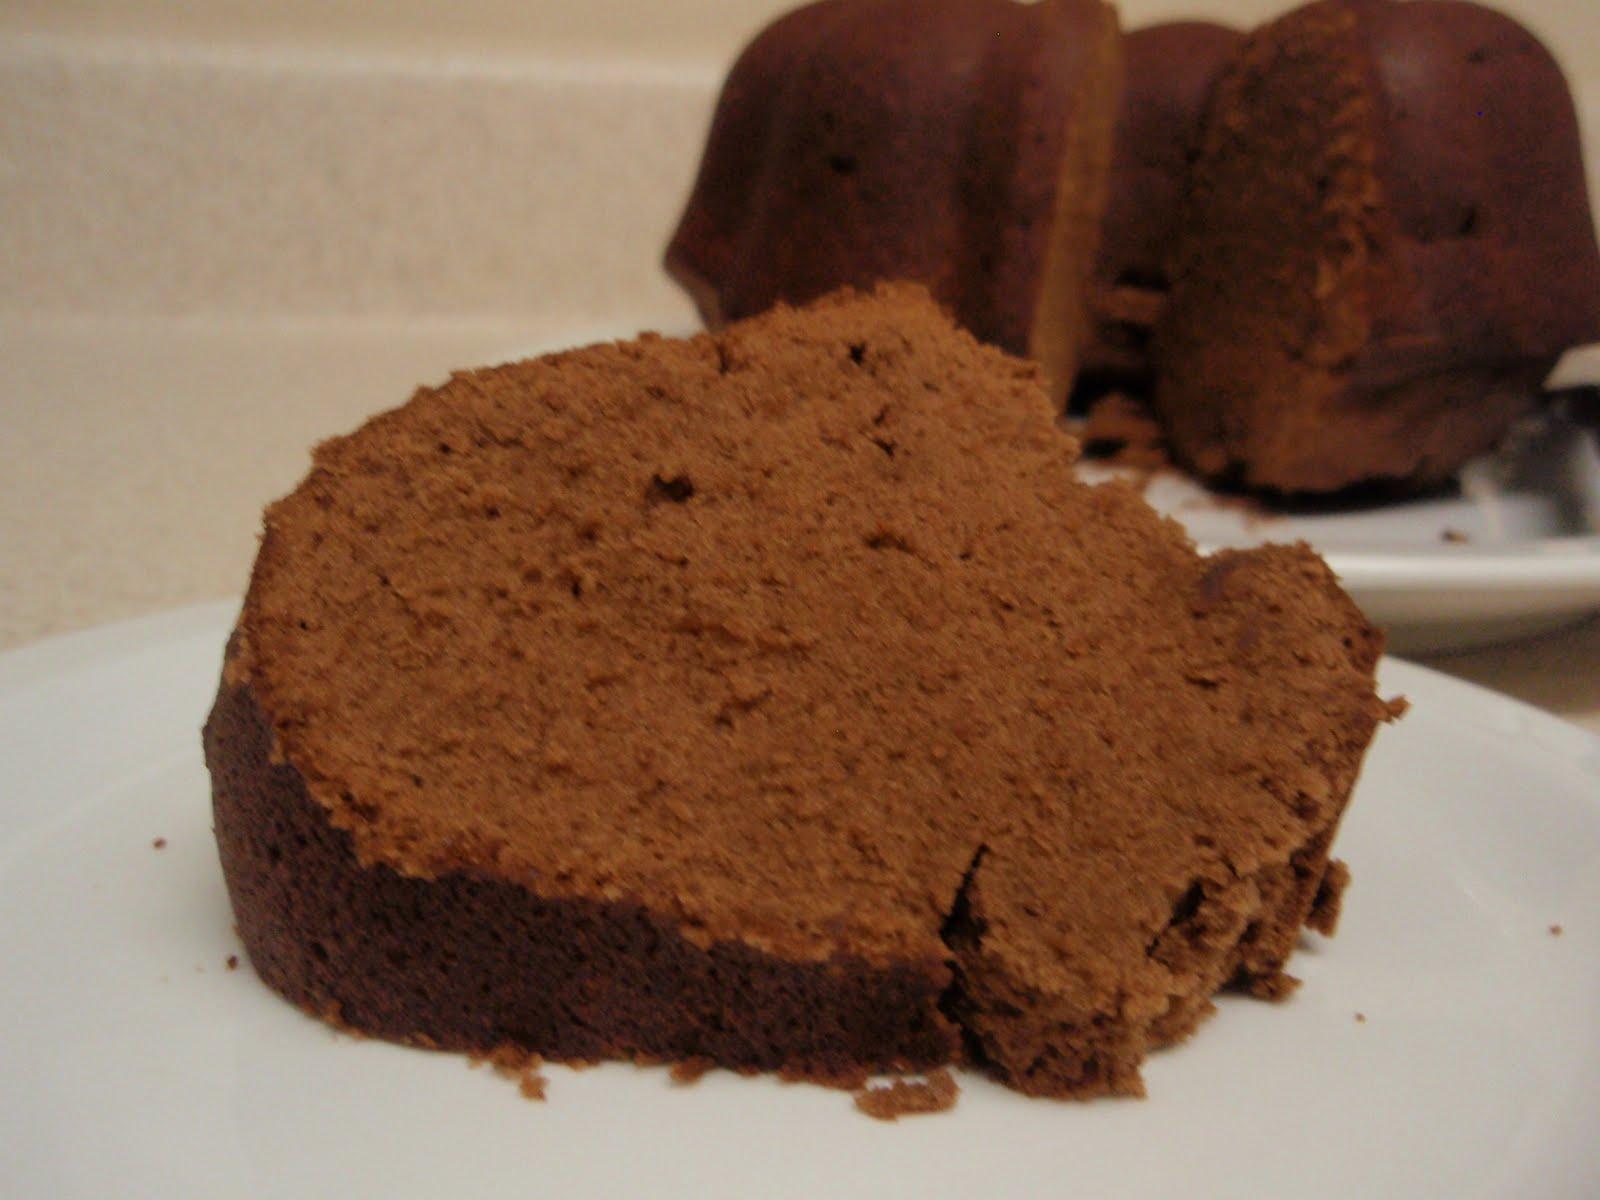 boys bake better: Chocolate Bourbon Bundt Cake